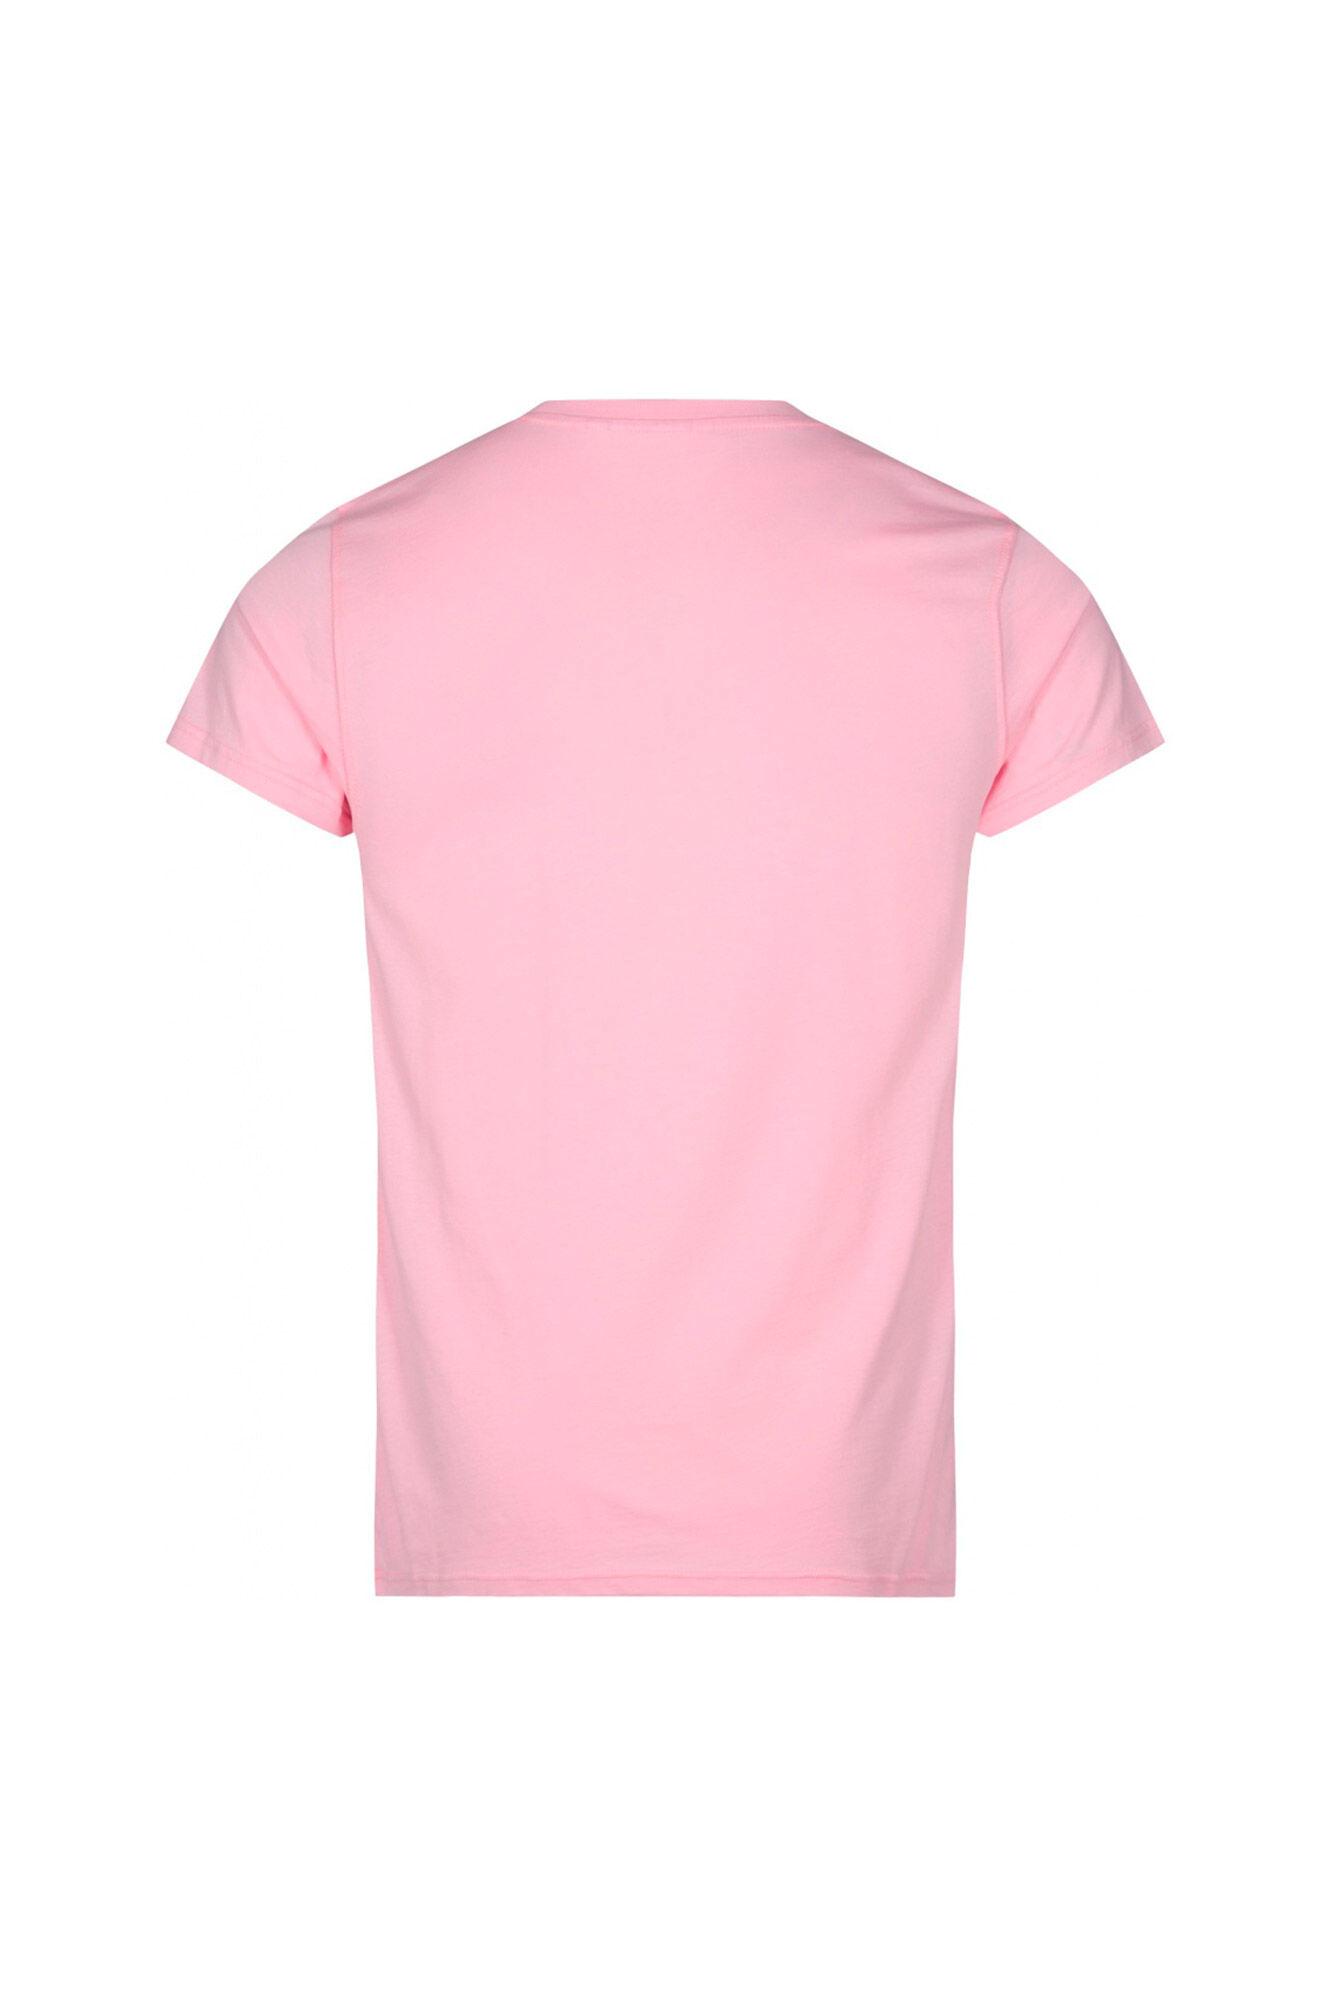 The t-shirt FA900012, LIGHT PINK